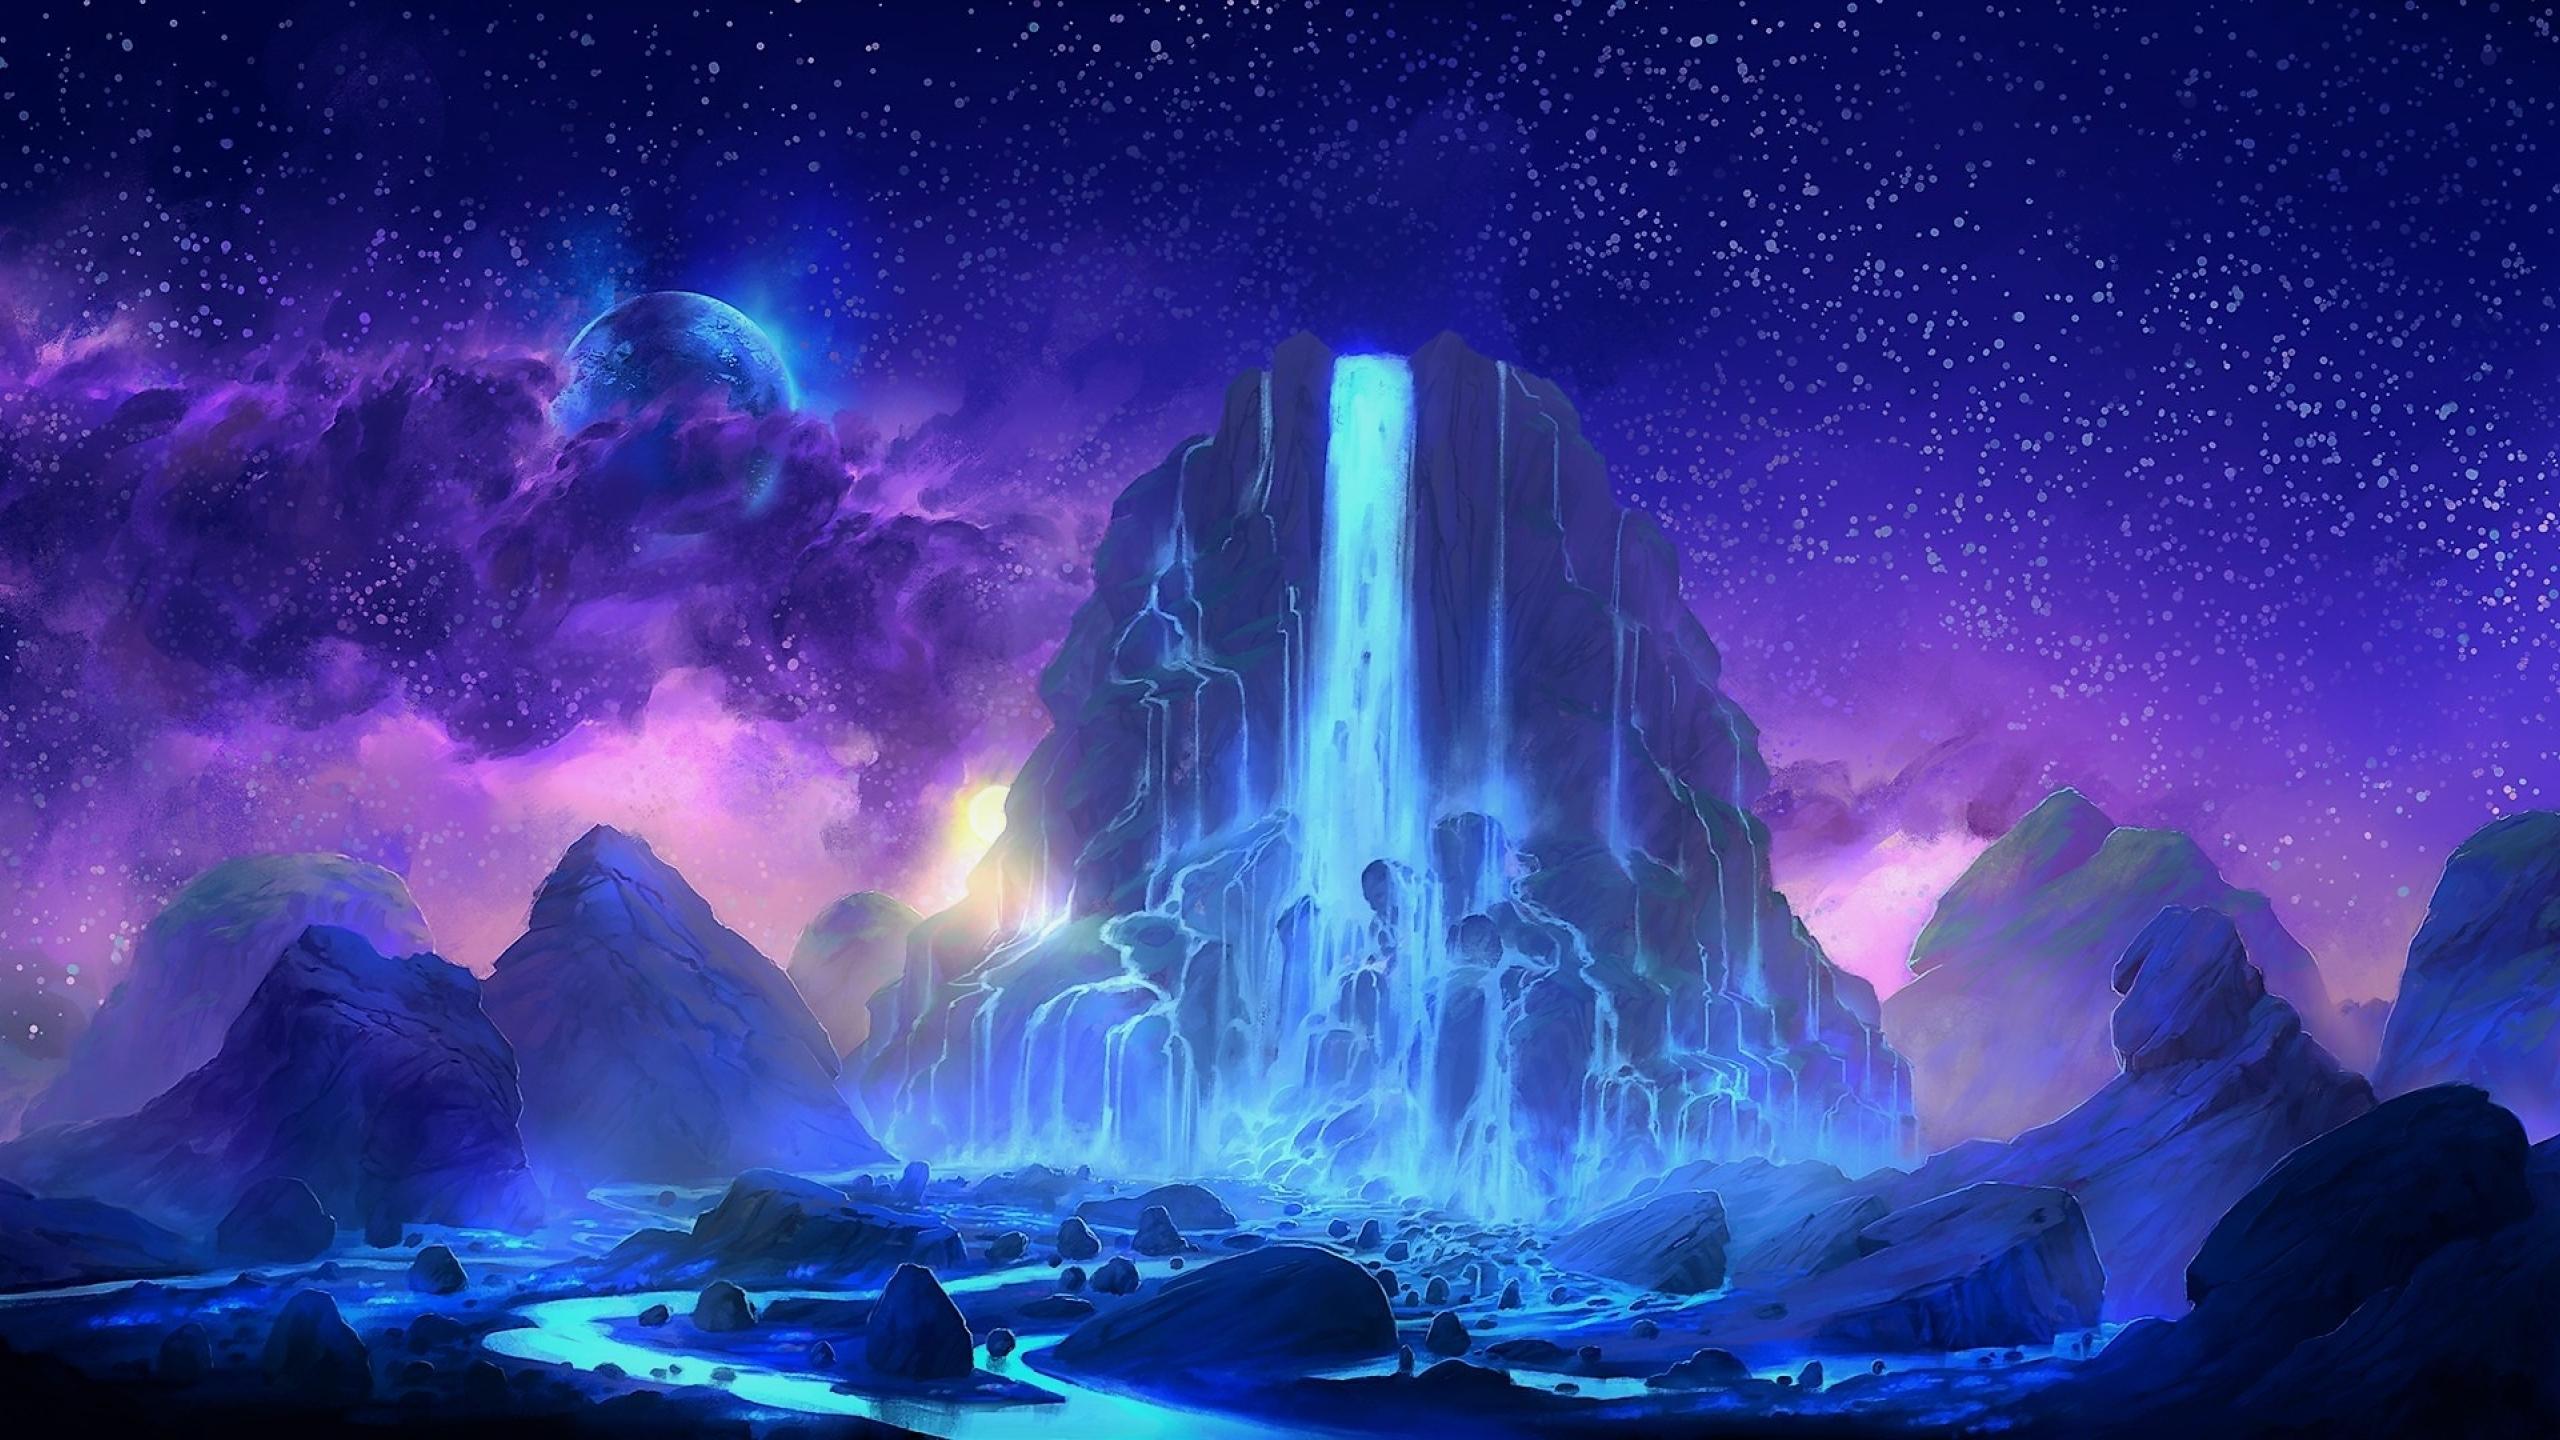 2k Hd Wallpapers: Fantasy Waterfall, Full HD 2K Wallpaper